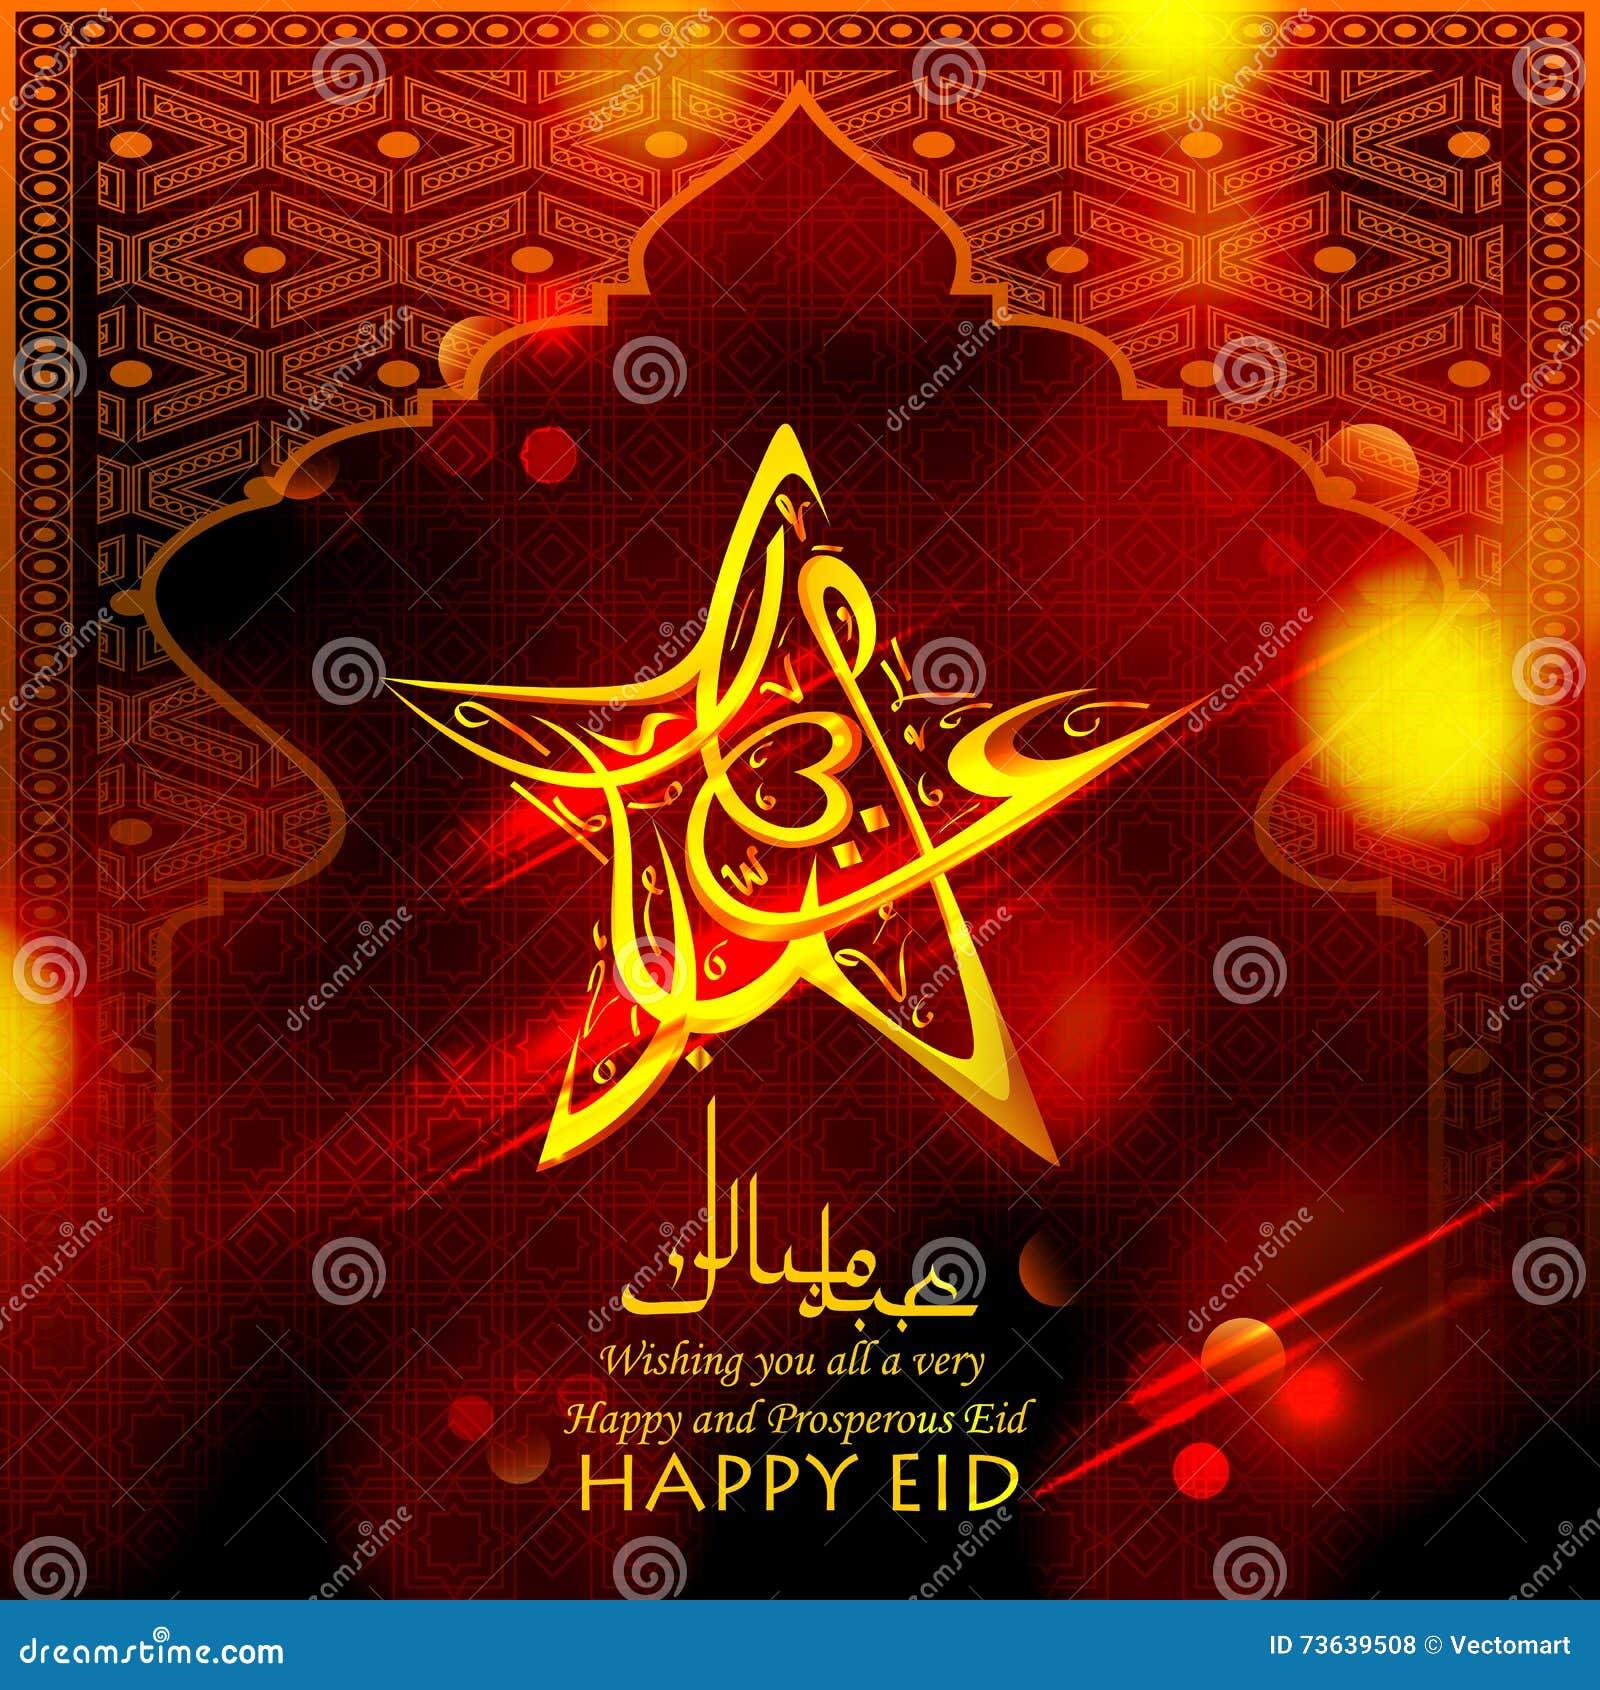 Eid Mubarak Greetings In Arabic Freehand Stock Vector Illustration